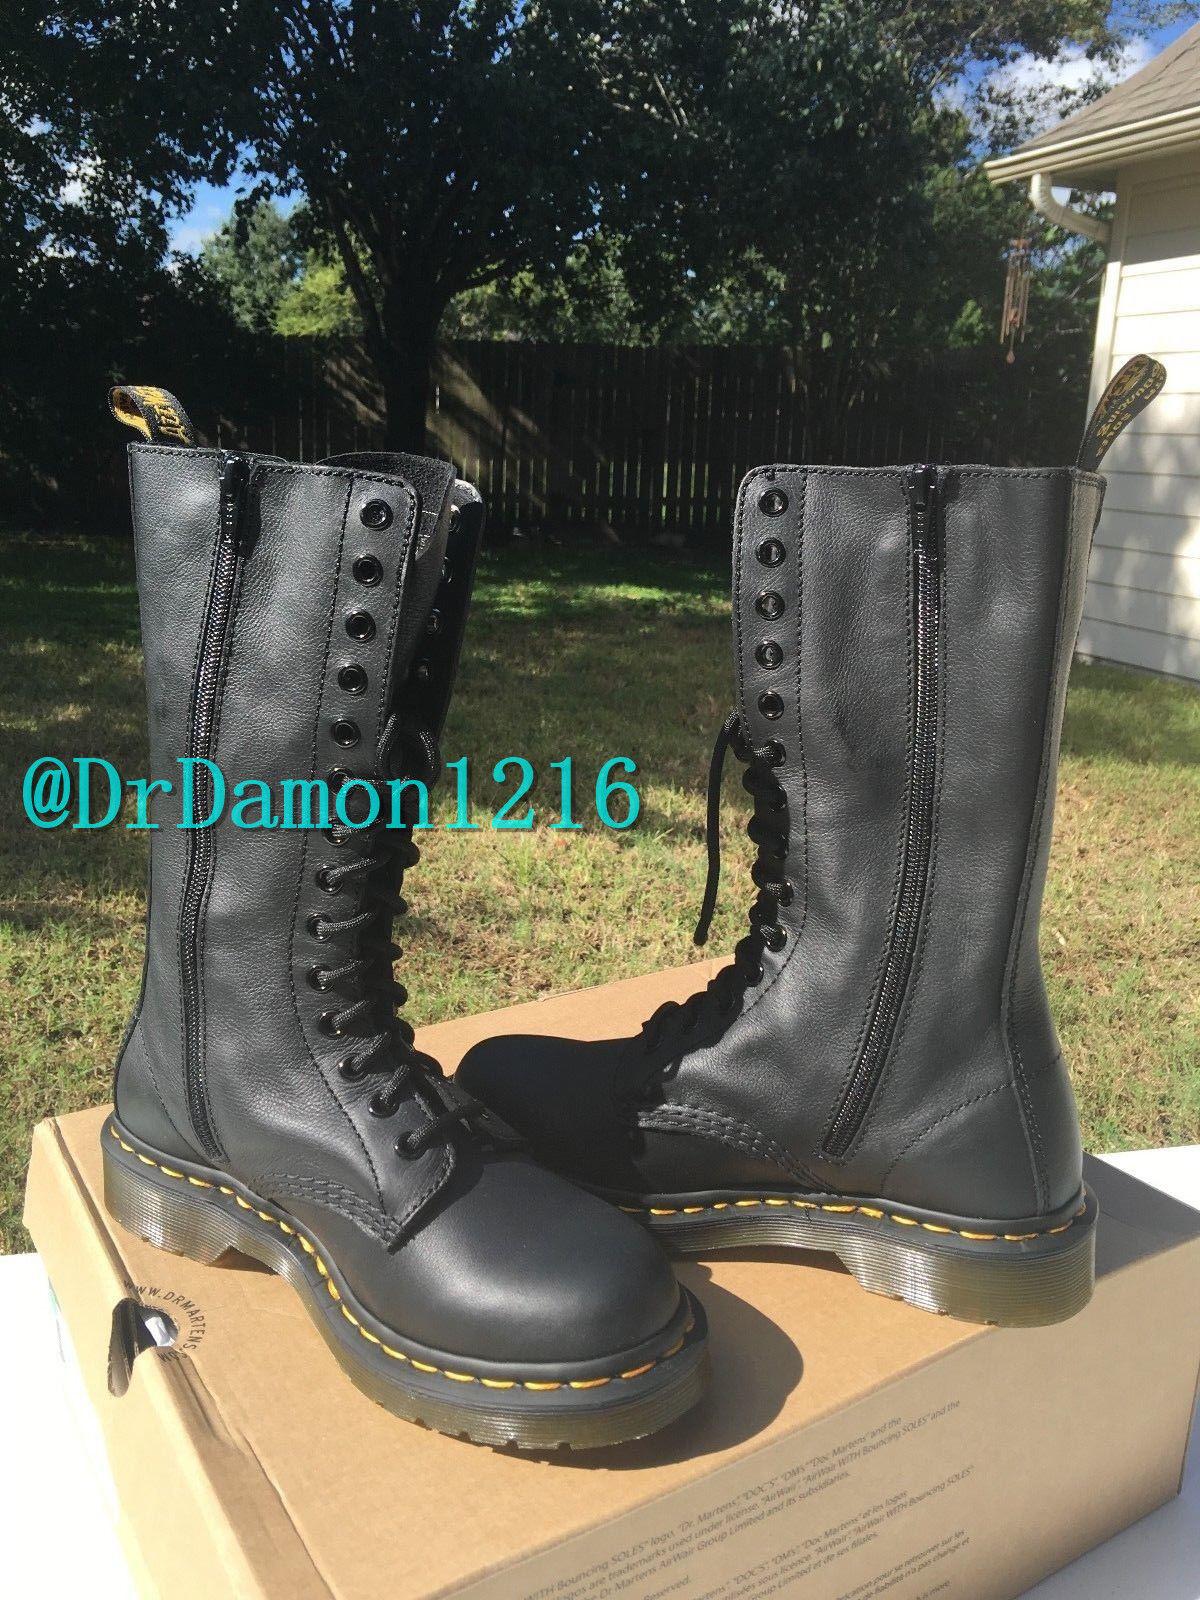 4f5ebc22f44 NIB Dr. Martens Women's 1B99 14 Eye Boot Virginia Soft Leather Black $170